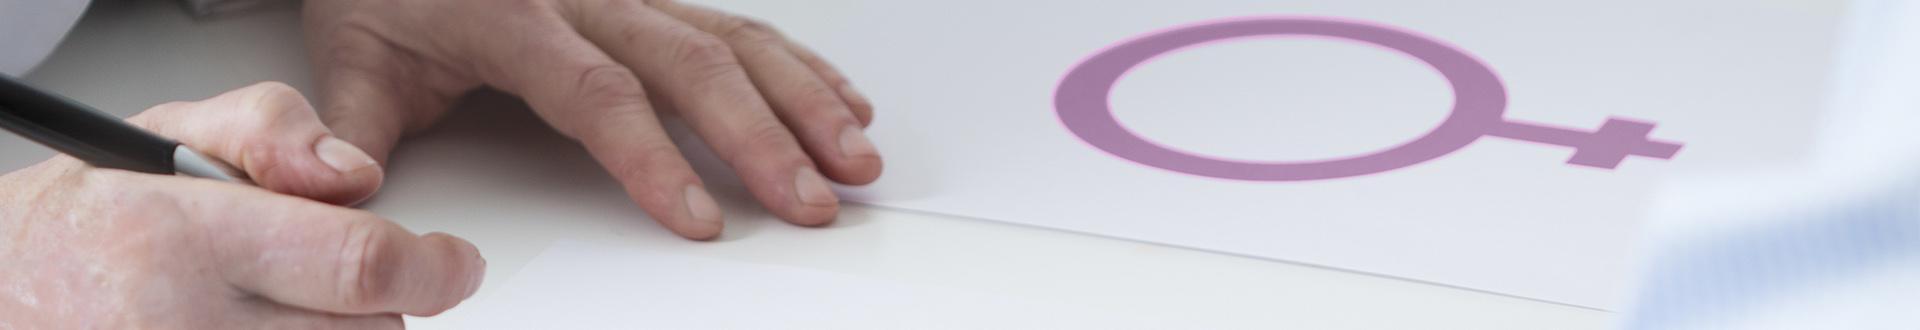 banner kontakt Gynovum indywidualna praktyka lekarska